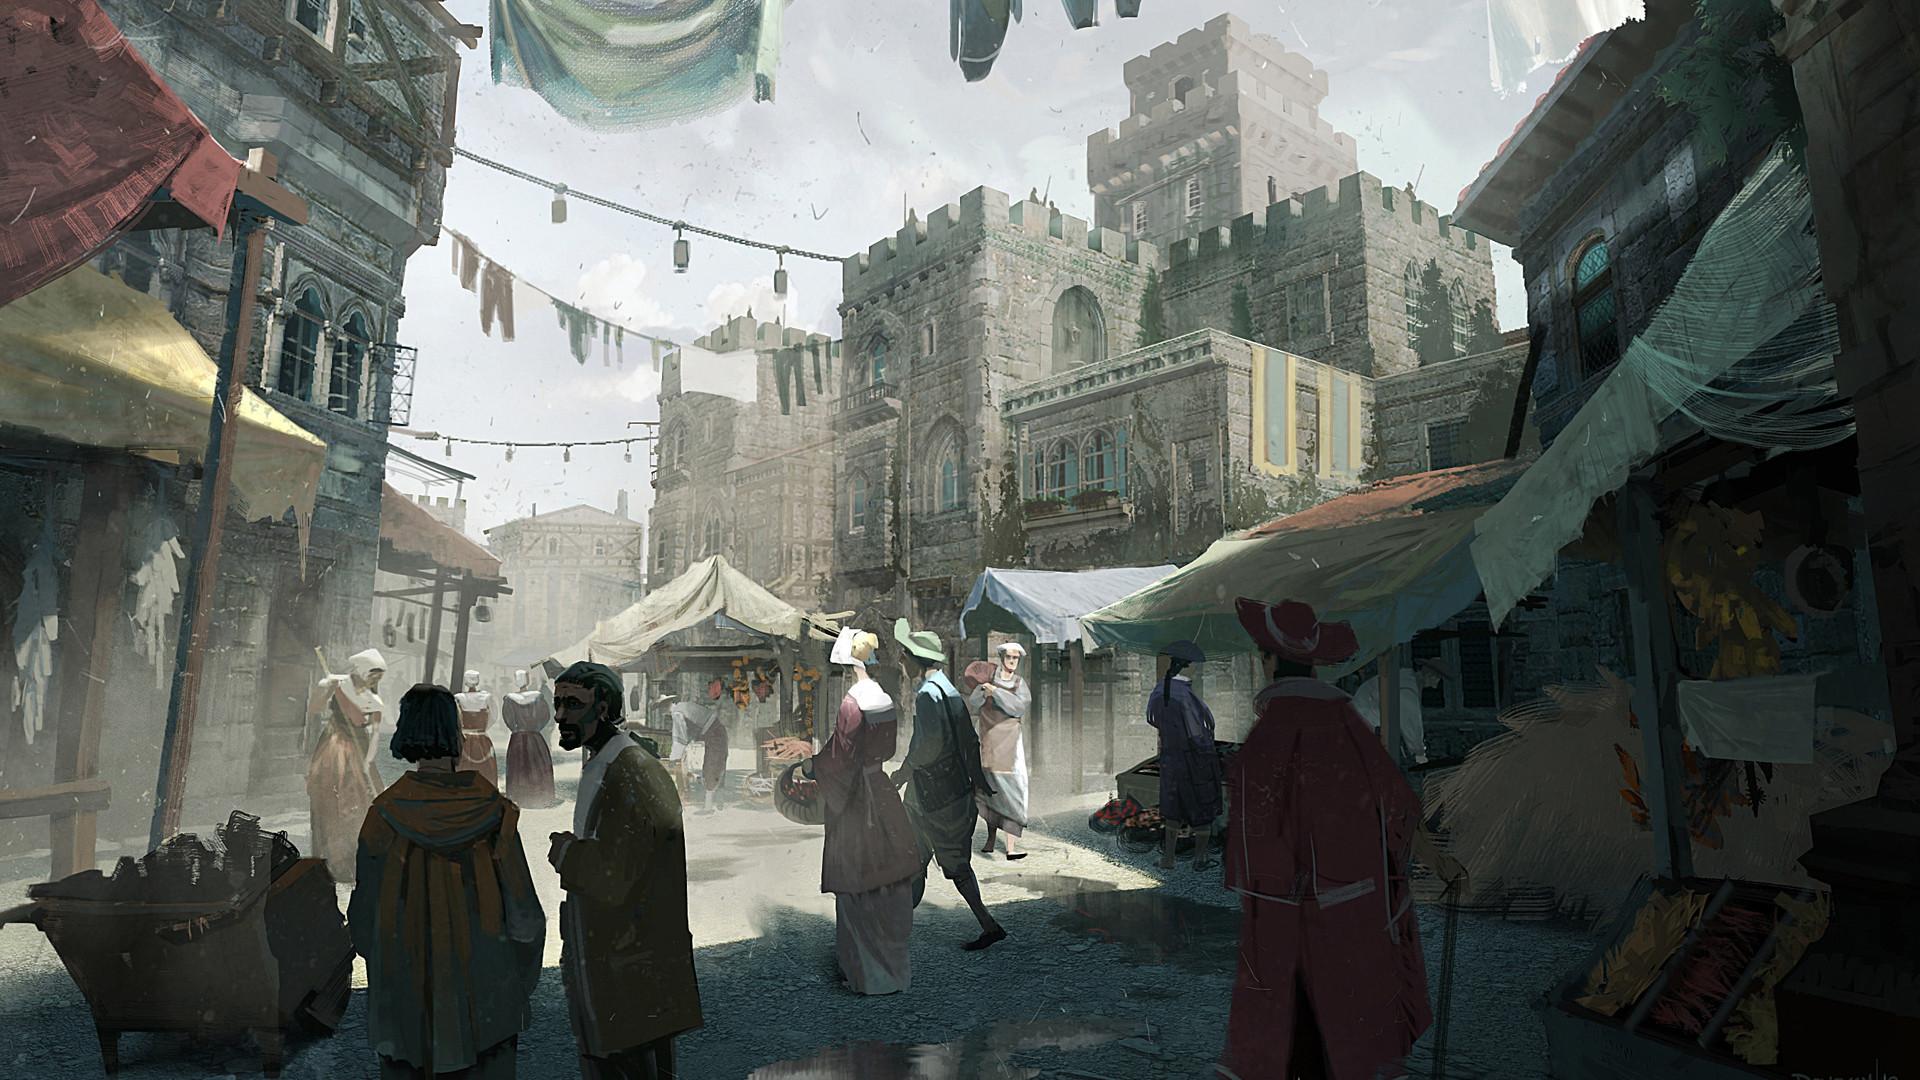 Assassins Creed Brotherhood Wallpaper: Assassin's Creed: Brotherhood Wallpapers, Pictures, Images